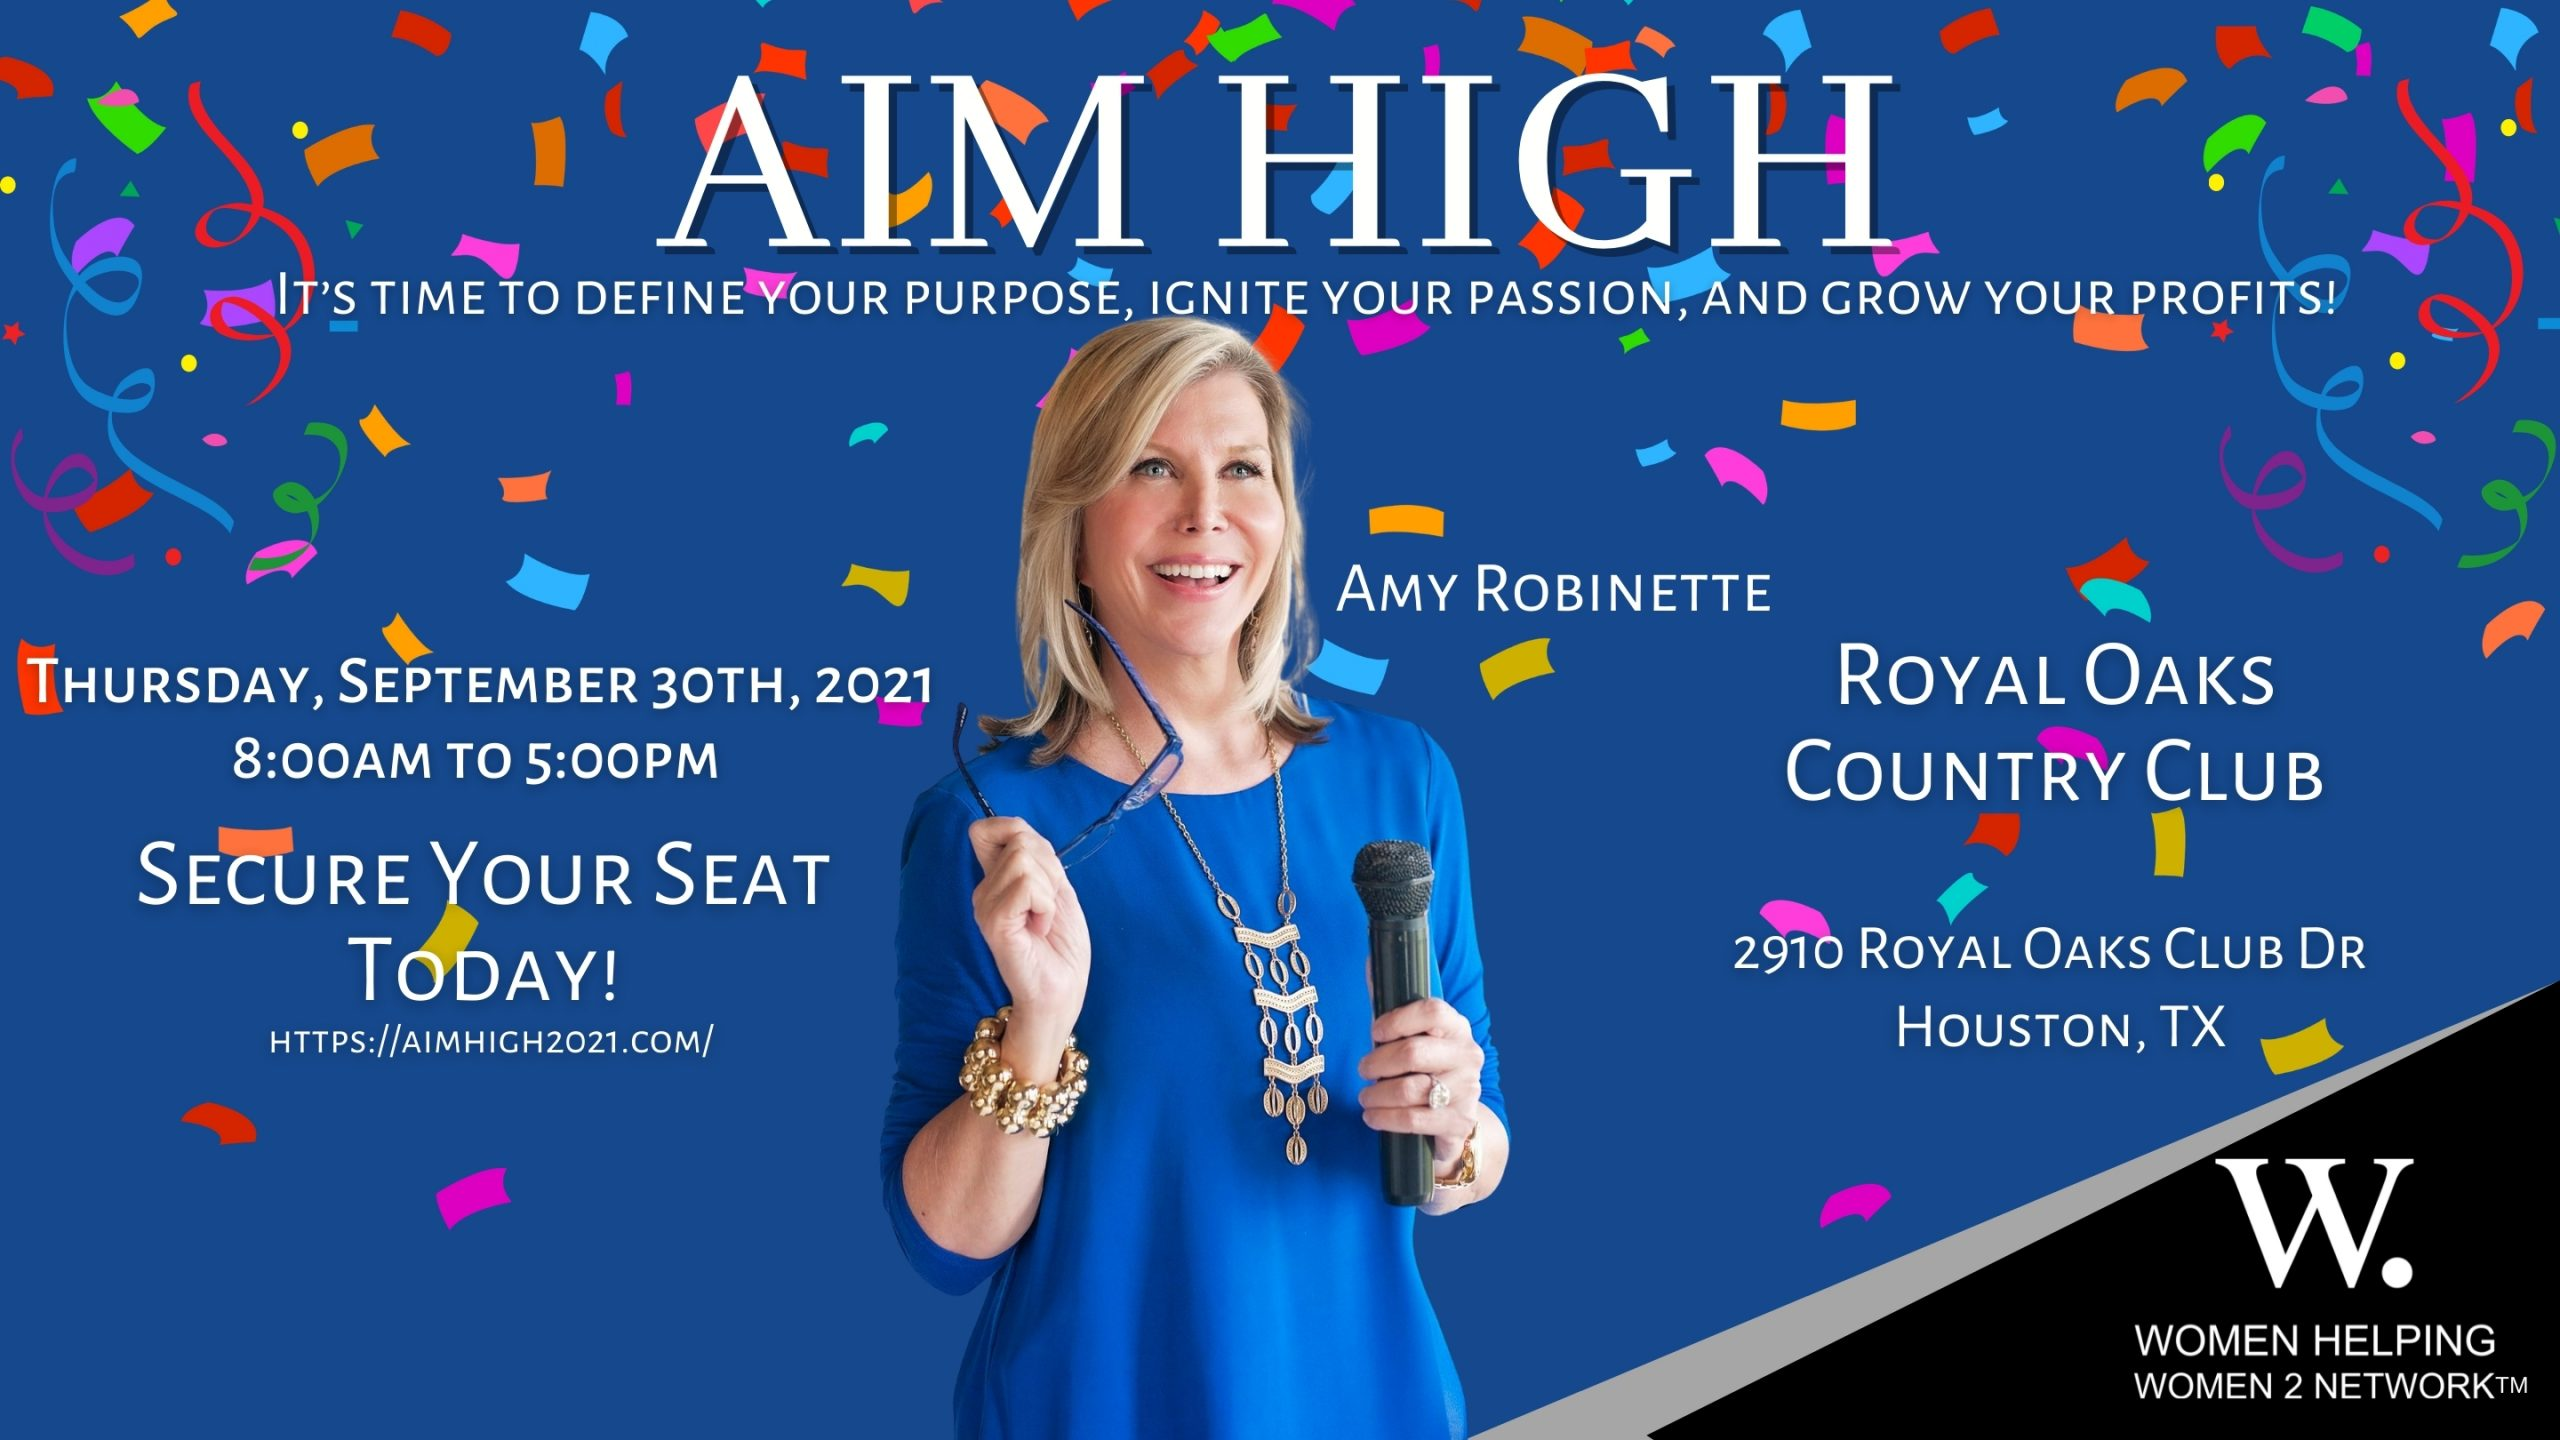 Aim High & Why